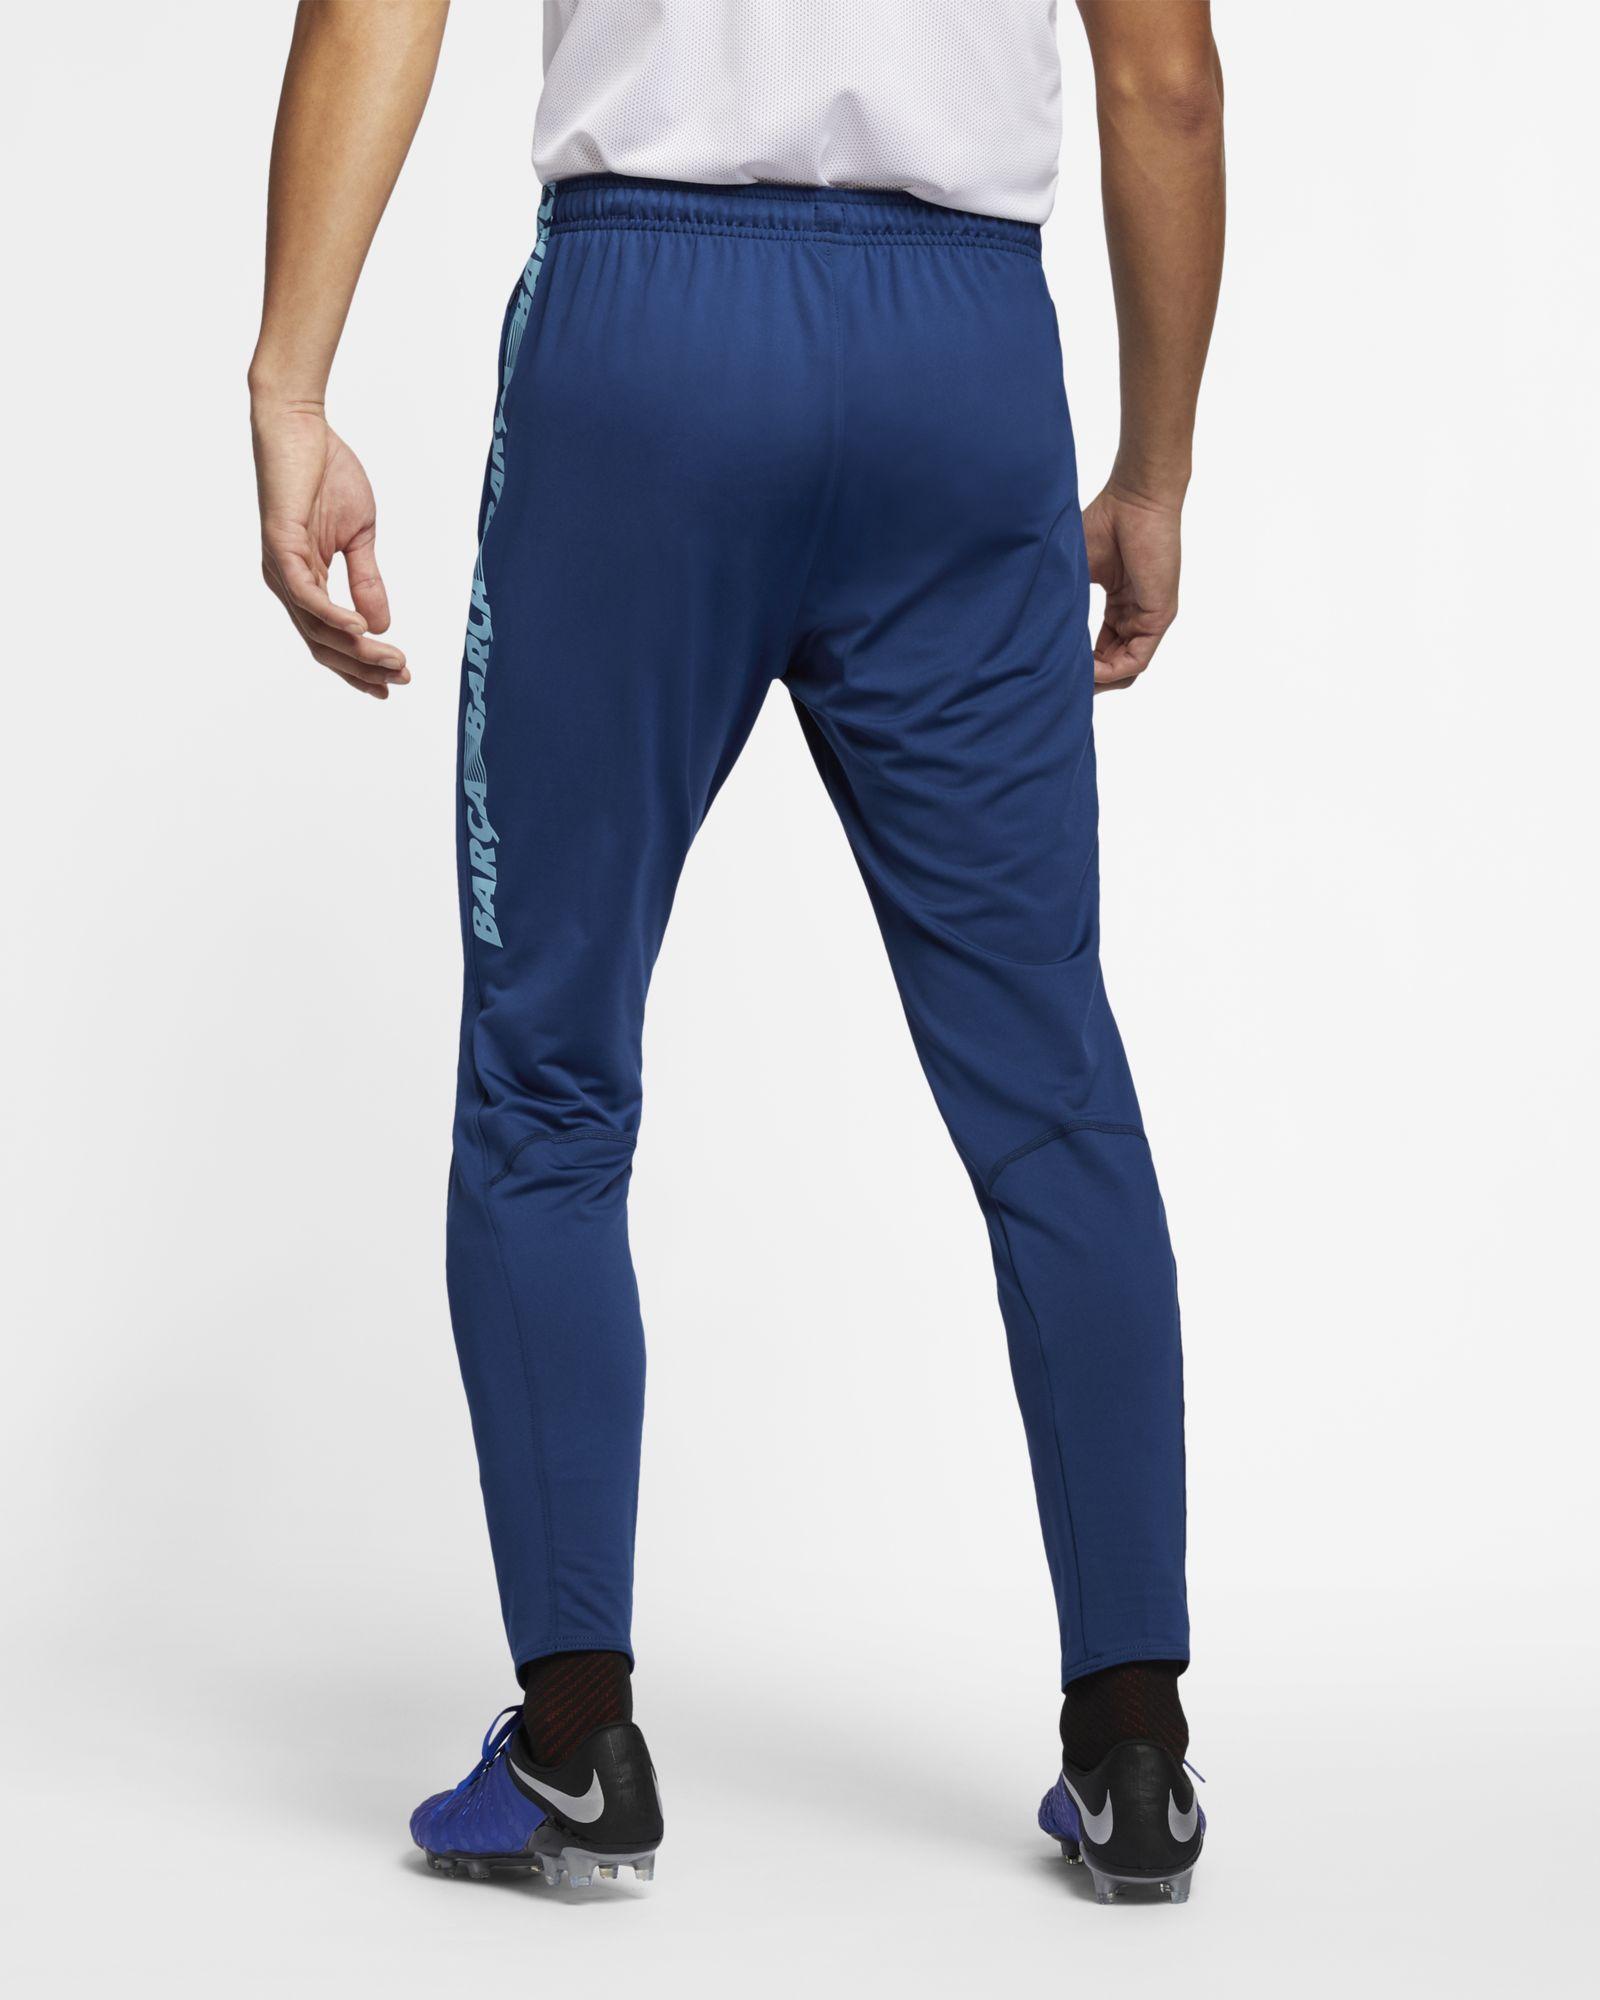 Nike FC Barcelona 2018 19 Dri-FIT Squad Pants - Soccer Shop Barcelona FC  Merchandise - Superfanas.lt 7fac9198f